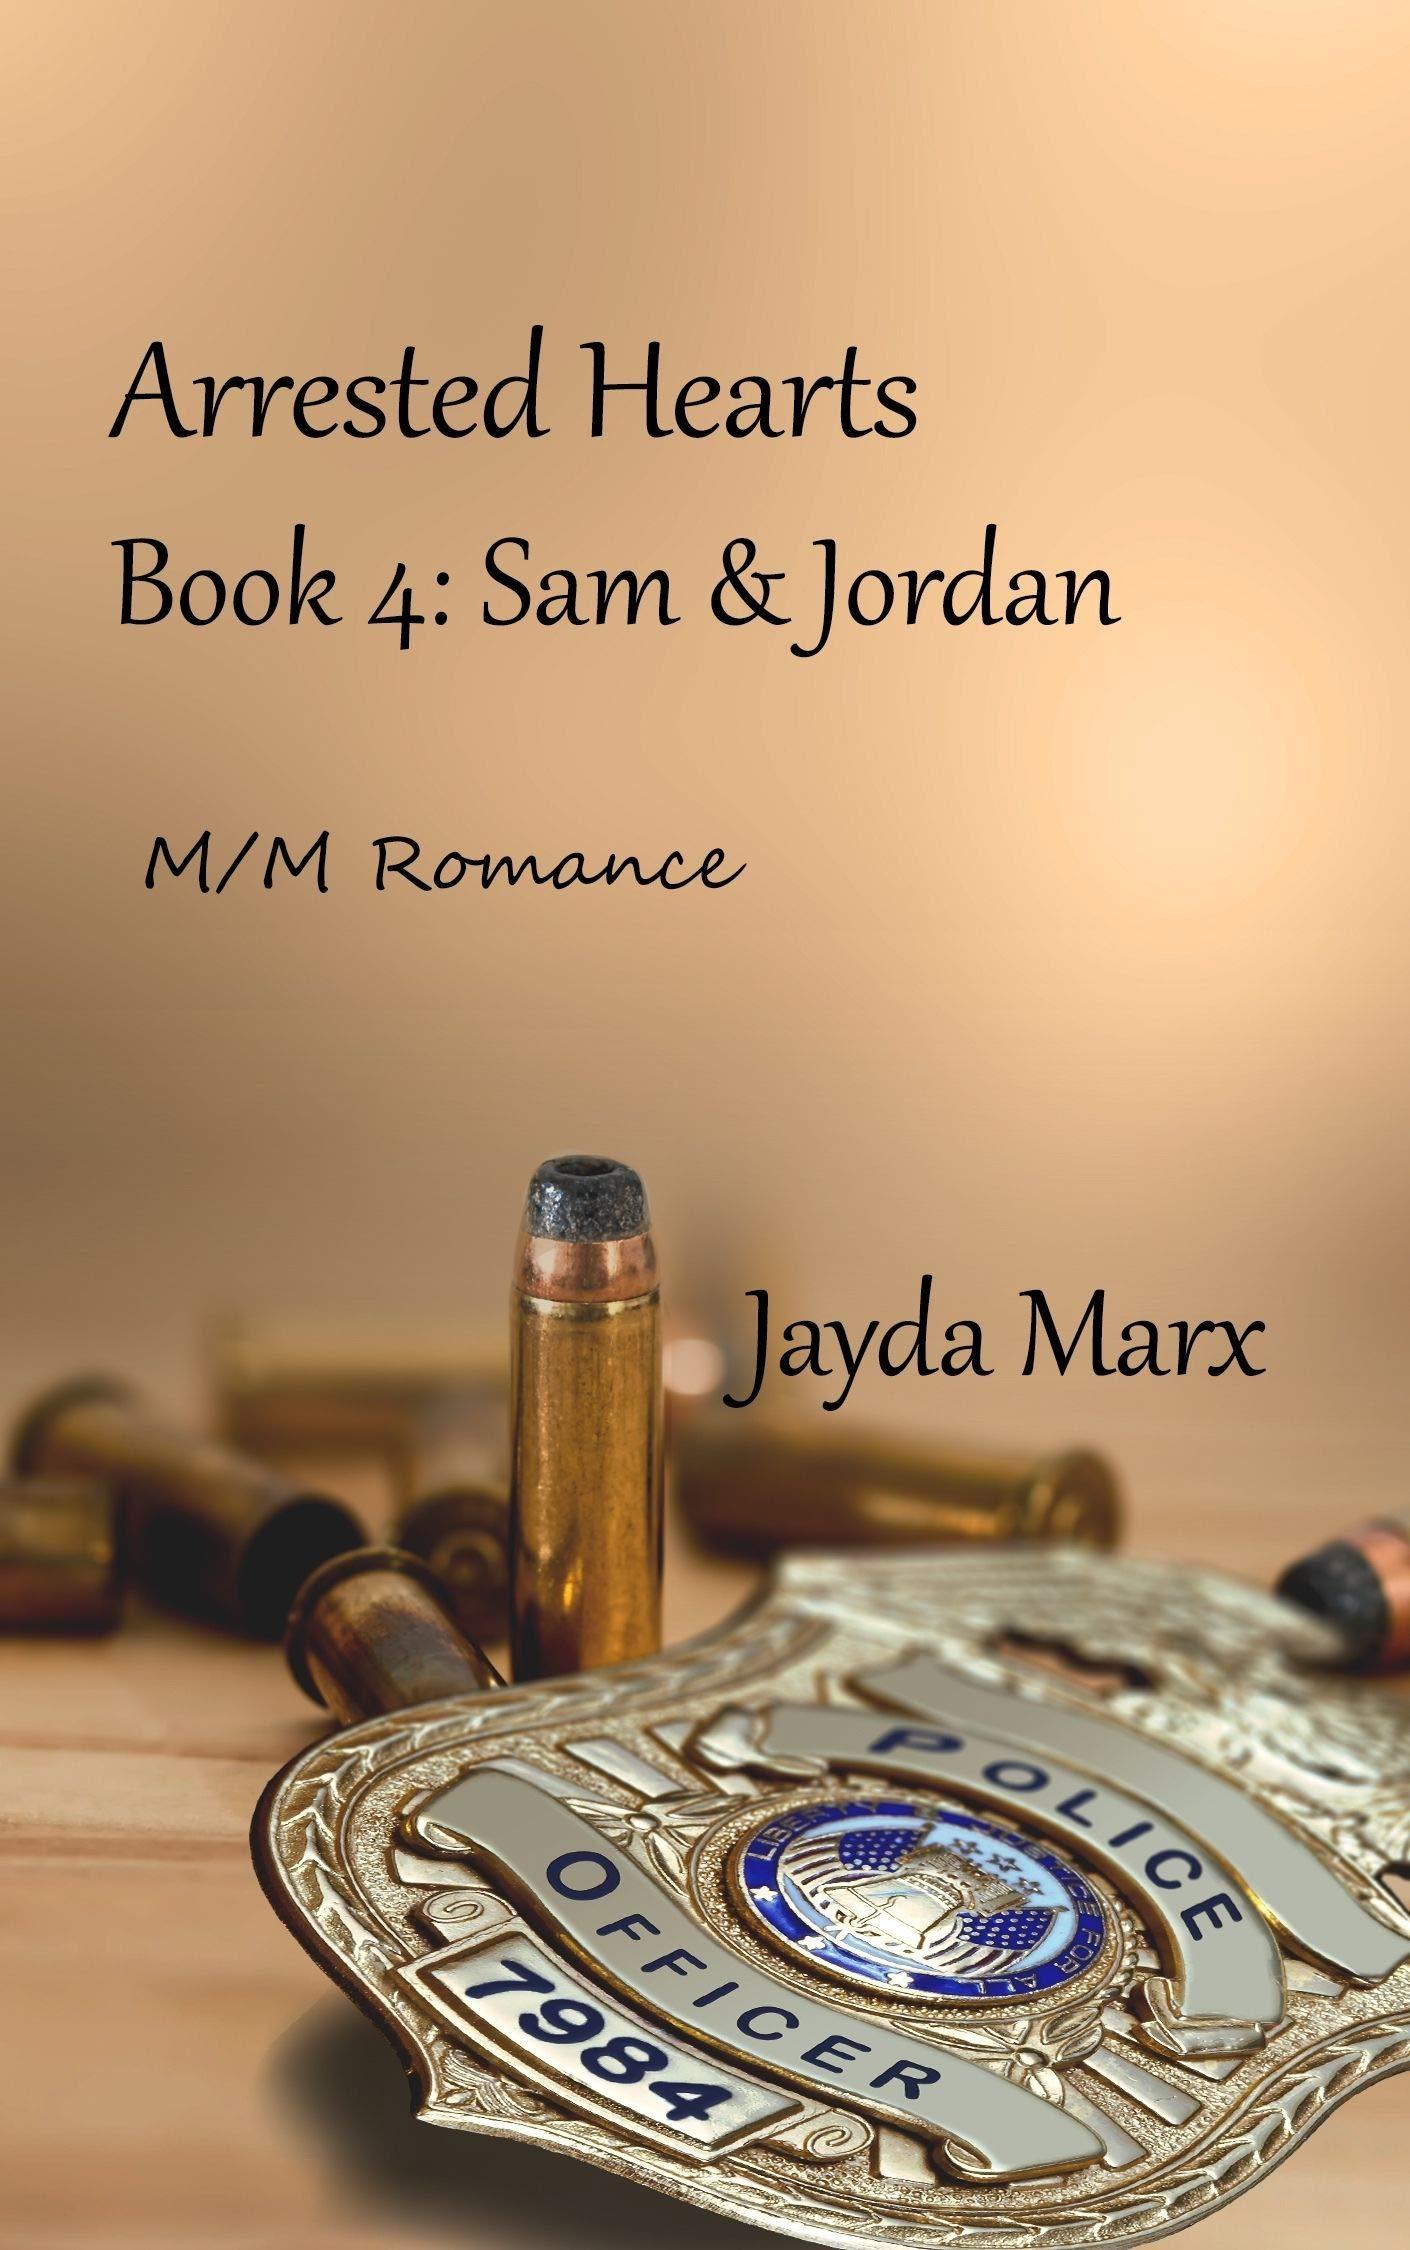 Sam & Jordan (Arrested Hearts #4)